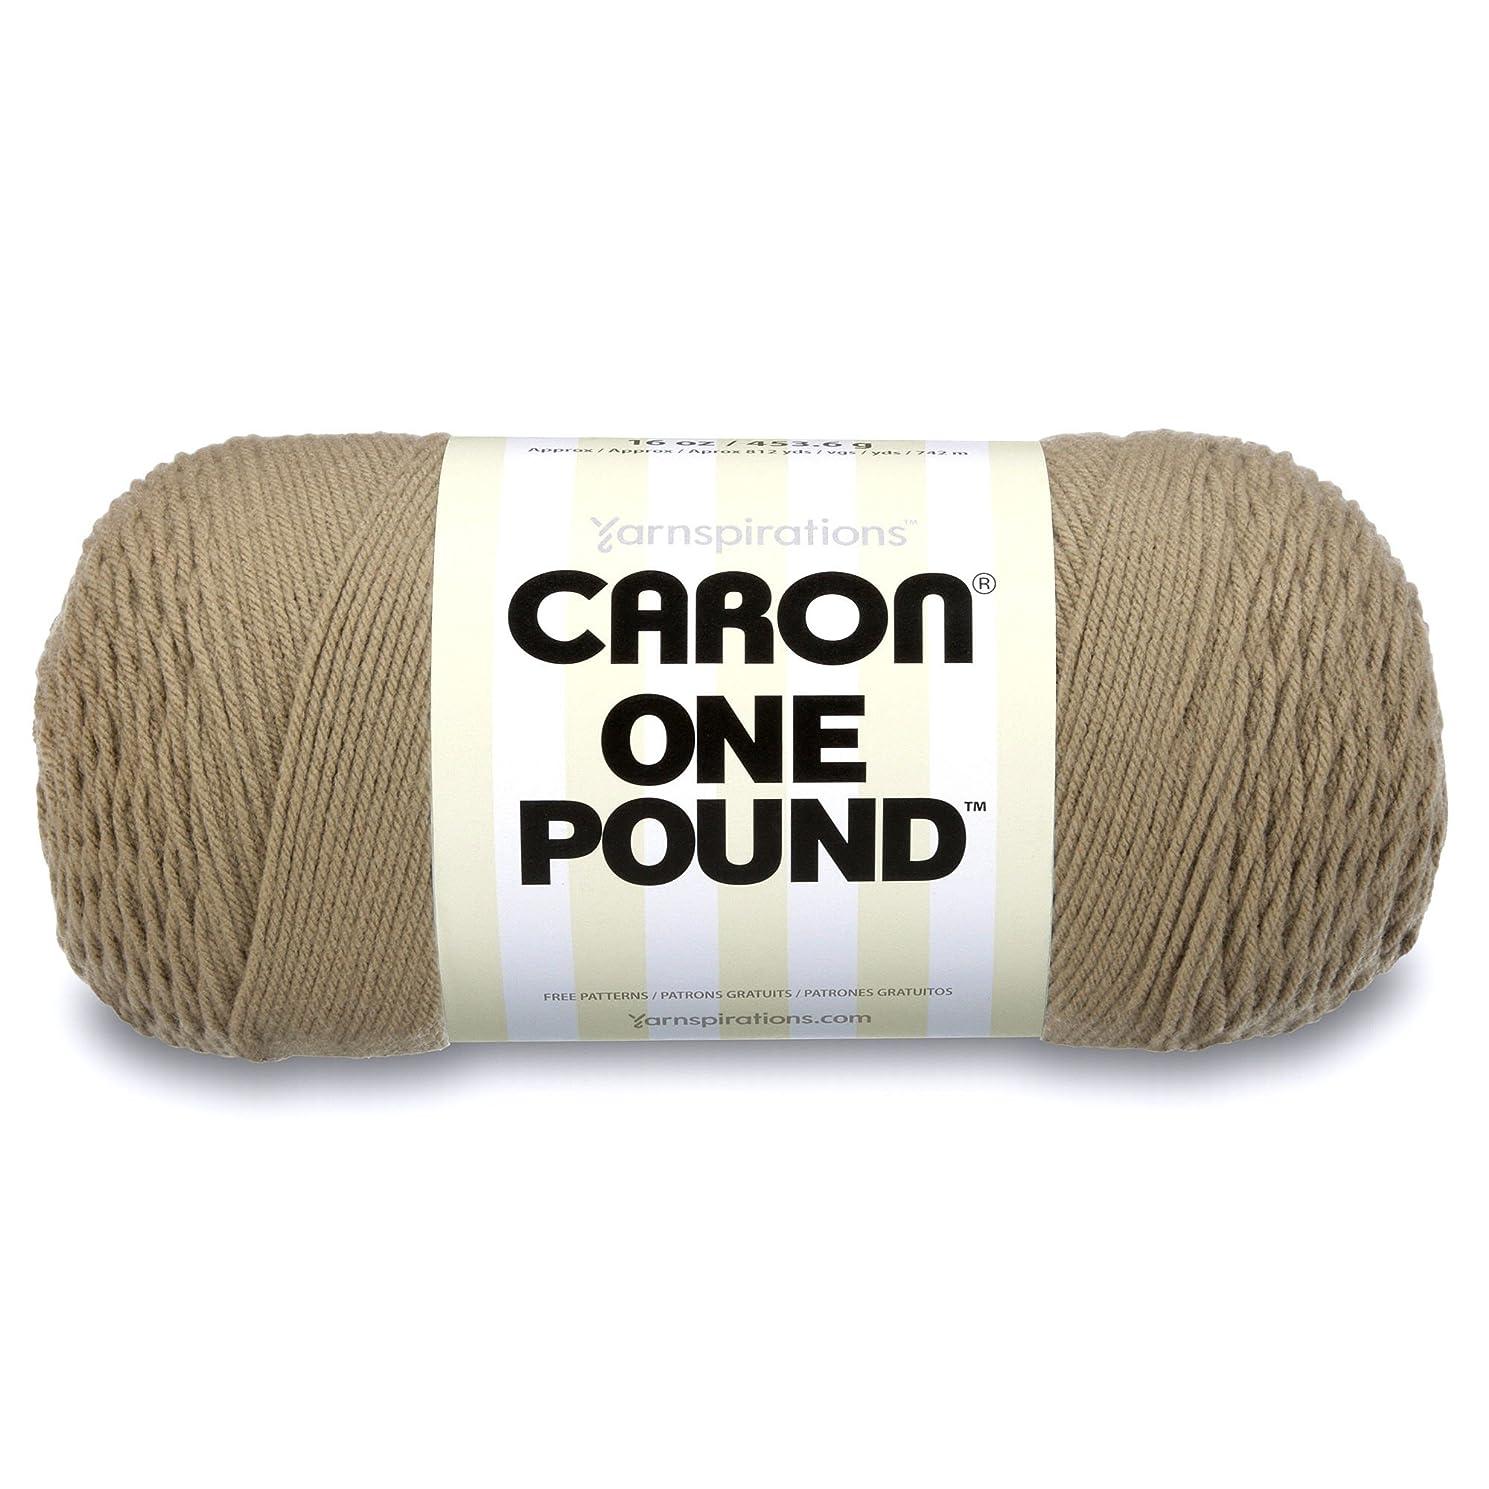 Caron  One Pound Solids Yarn - (4) Medium Gauge 100% Acrylic - 16 oz -  Tae- For Crochet, Knitting & Crafting